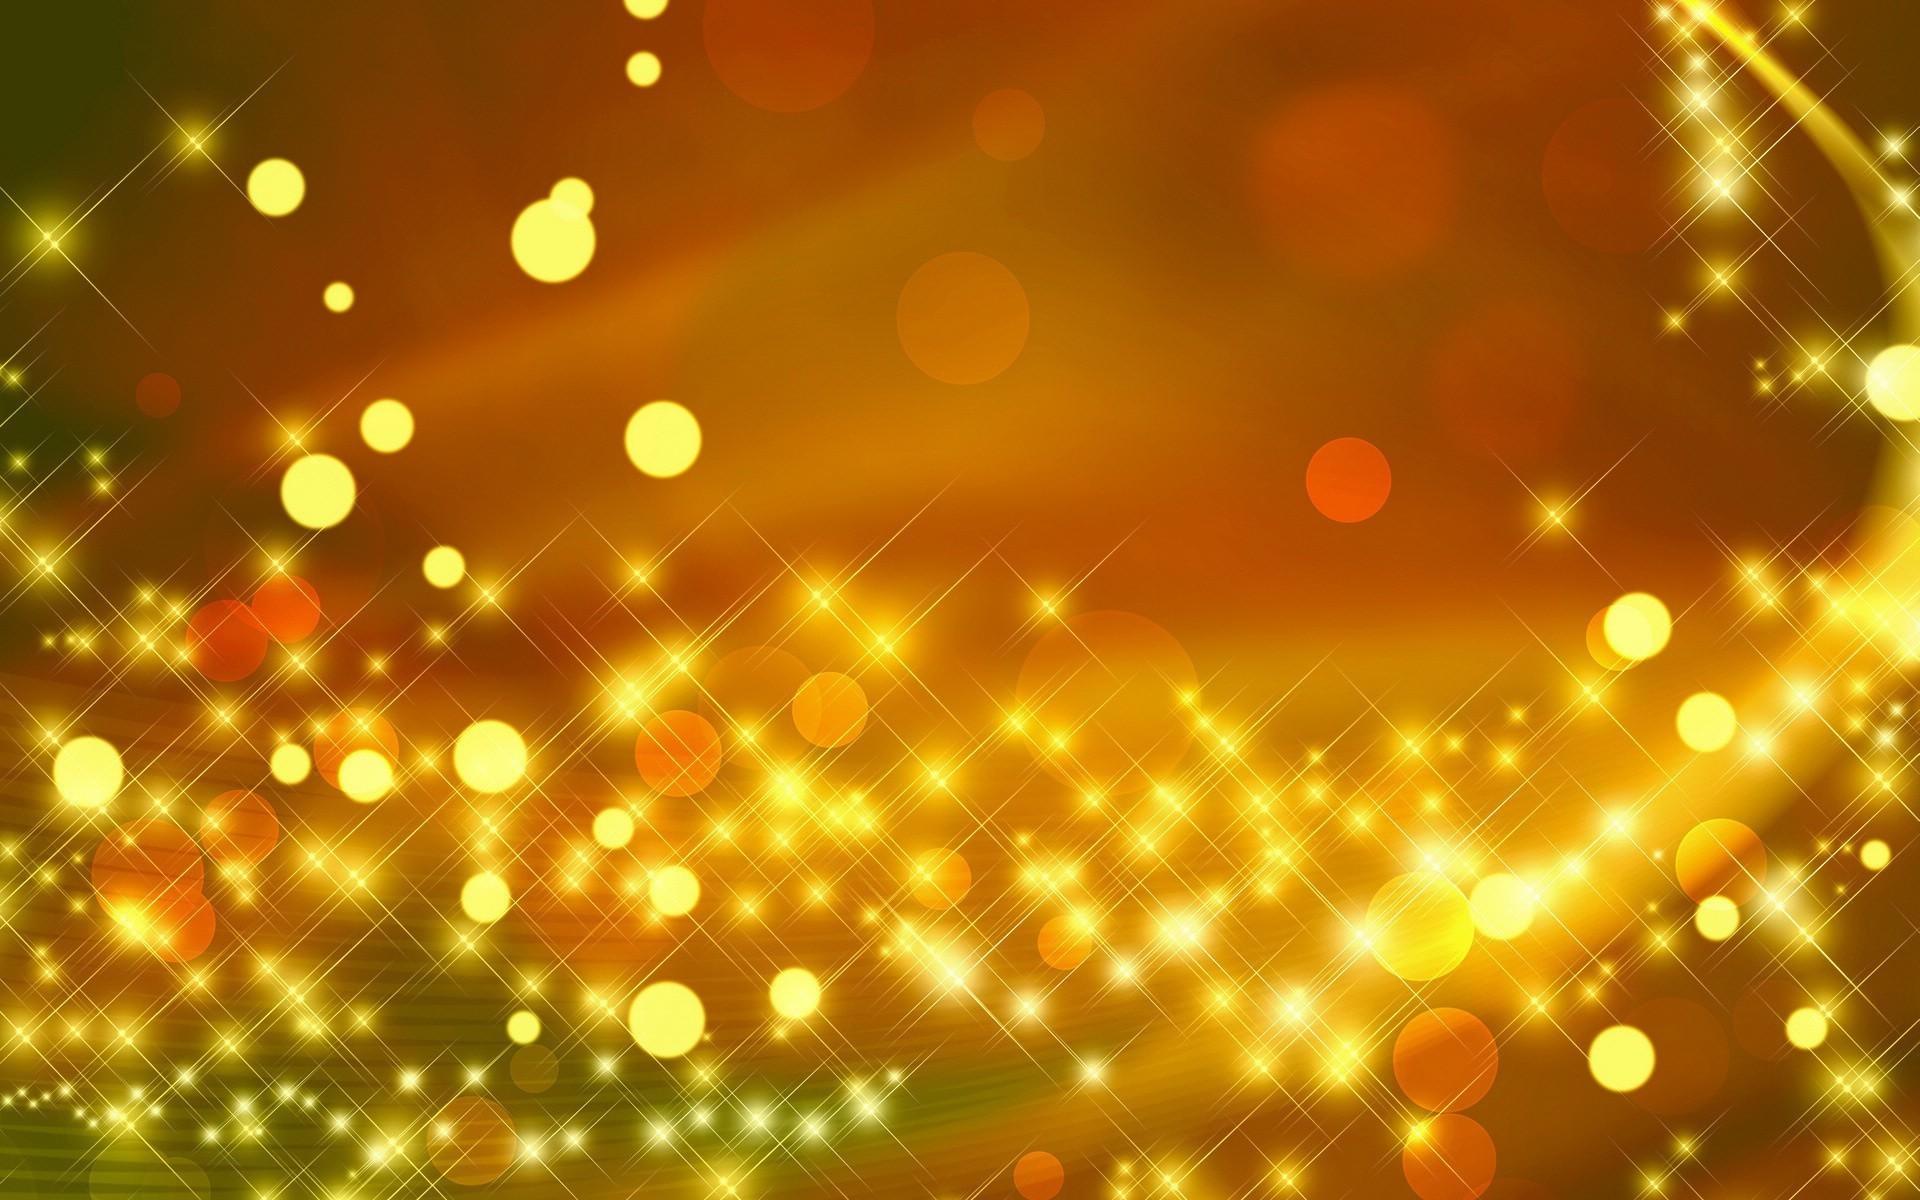 Gold Sparkly Wallpaper Desktop.